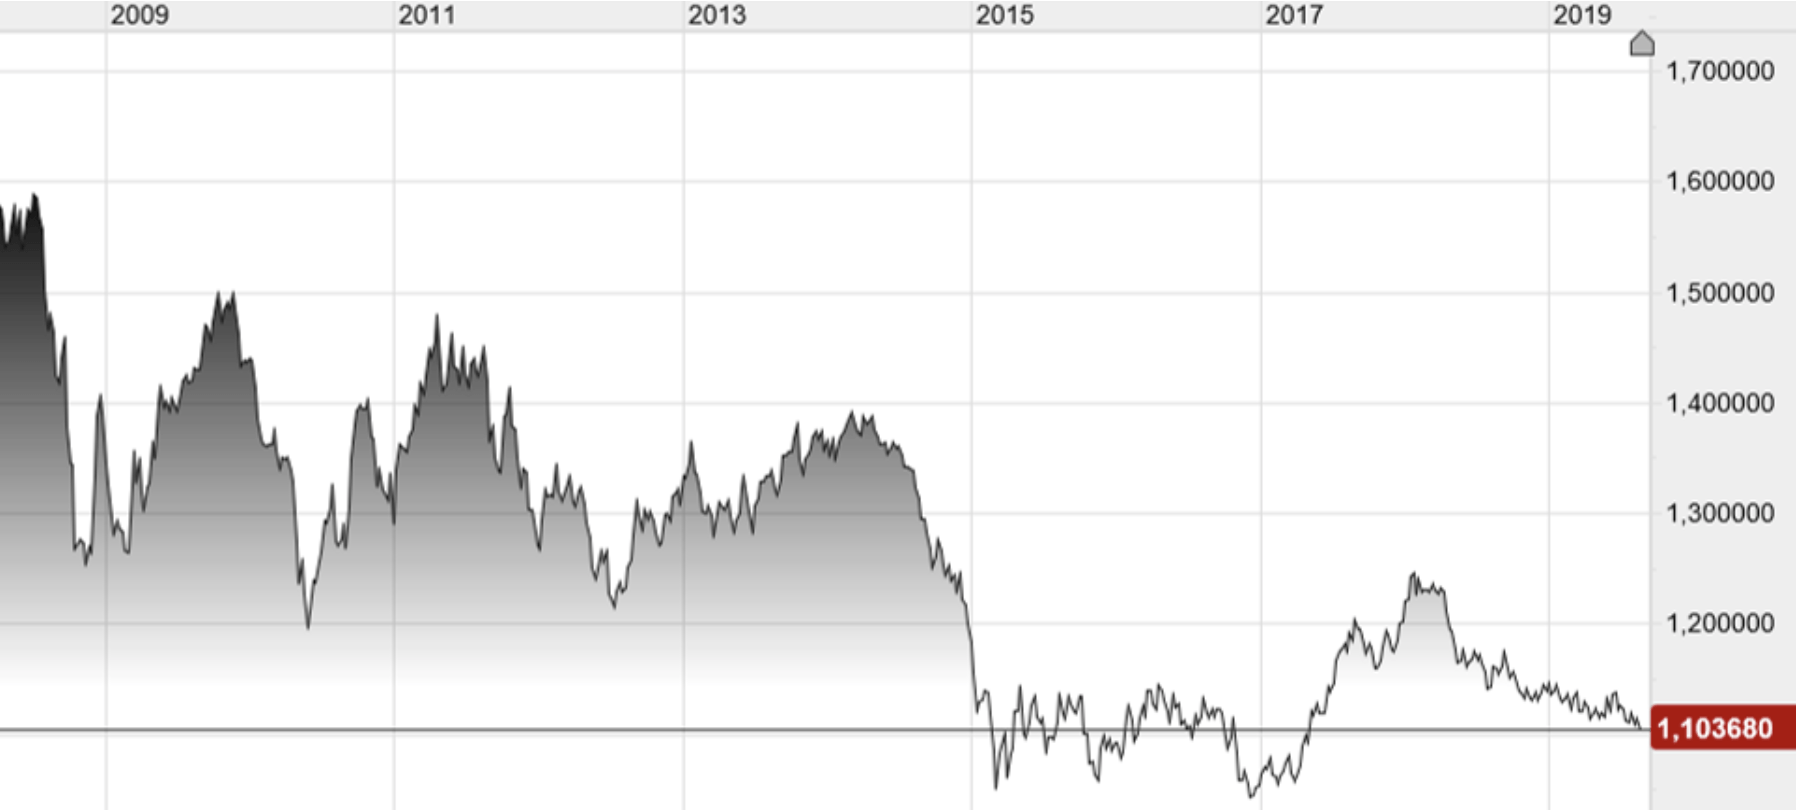 Europäische Zentralbank vs. Federal Reserve - Fallender Euro